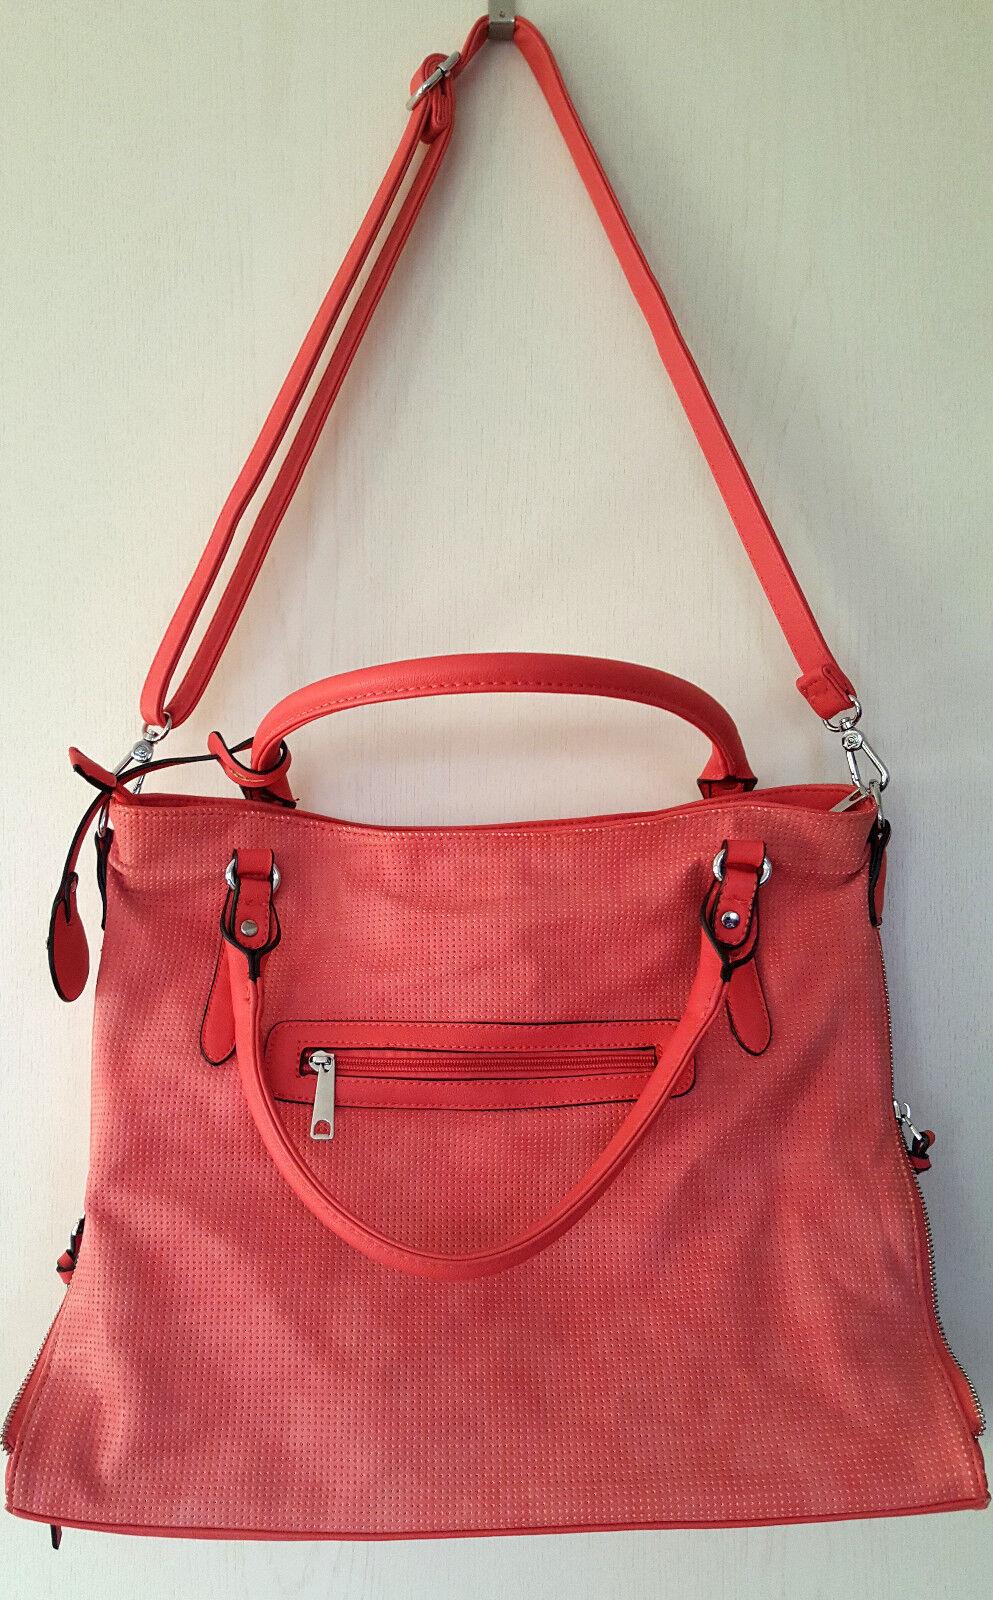 c14fd3d006b94 Handtaschen Damen Italienisch Test Vergleich +++ Handtaschen Damen ...